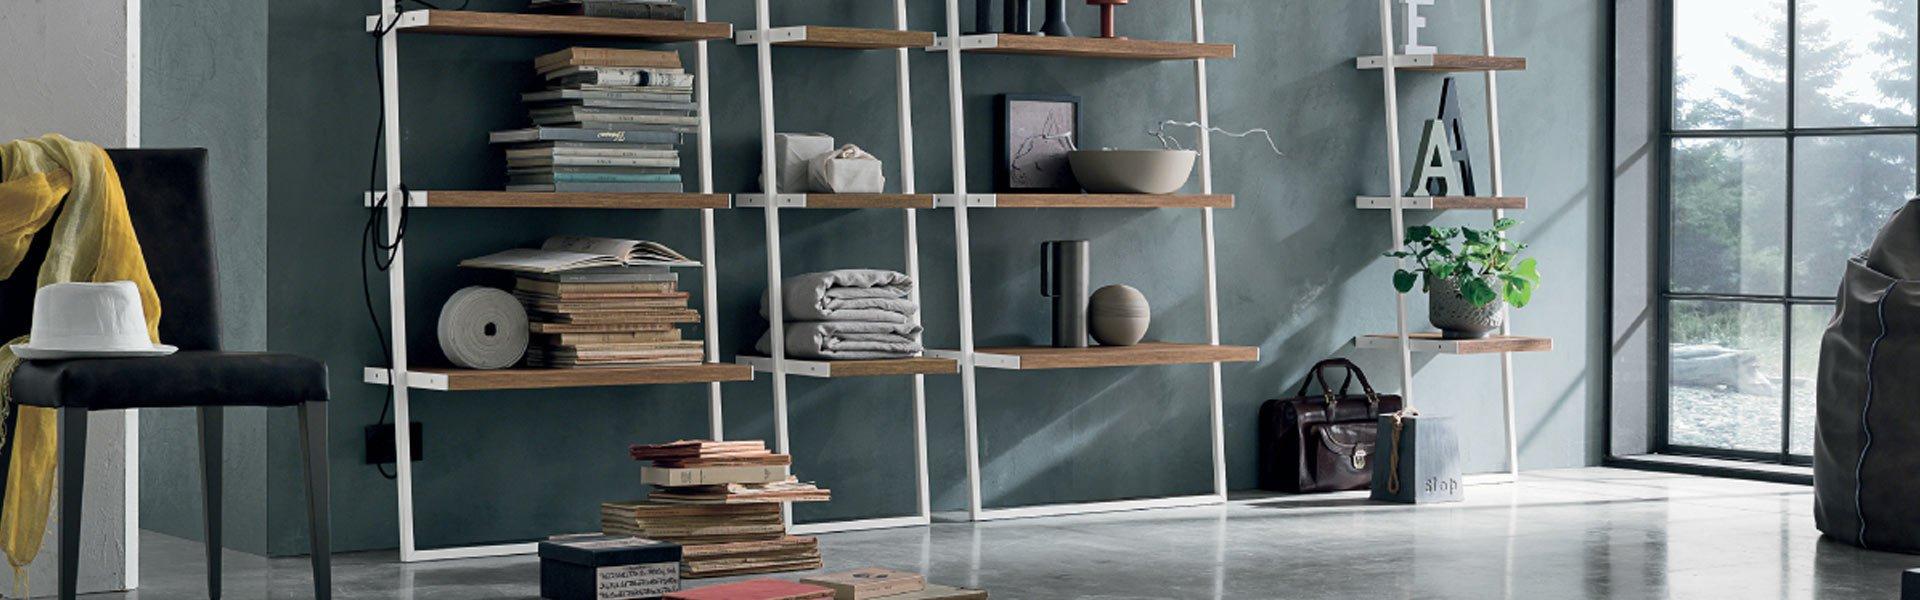 Abitastore arredamento online arredo casa for Arredo casa online shop